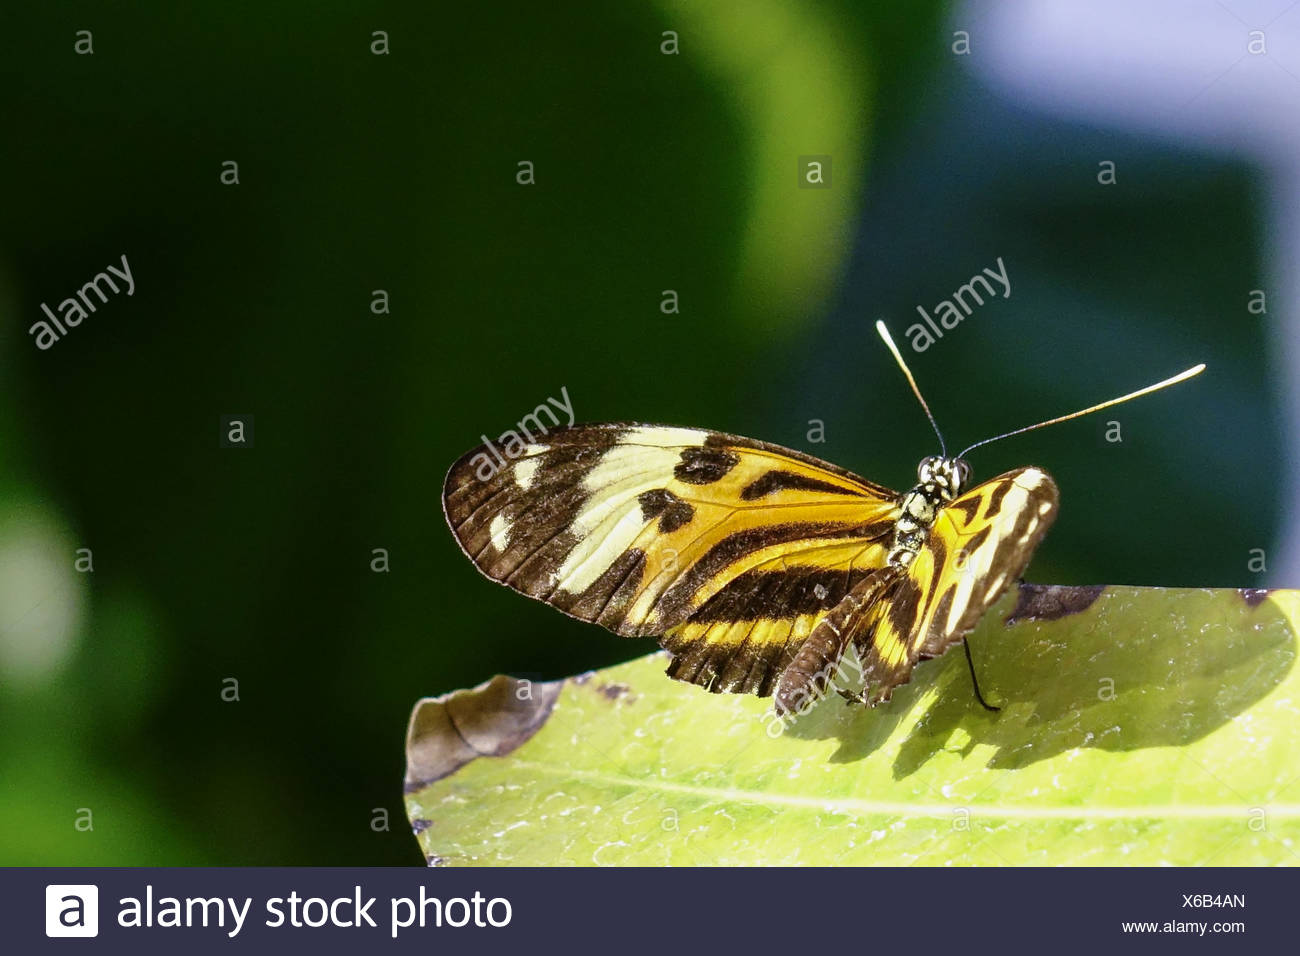 Tropischer Schmetterling, Edelfalter (Heliconius xanthocles) - Stock Image